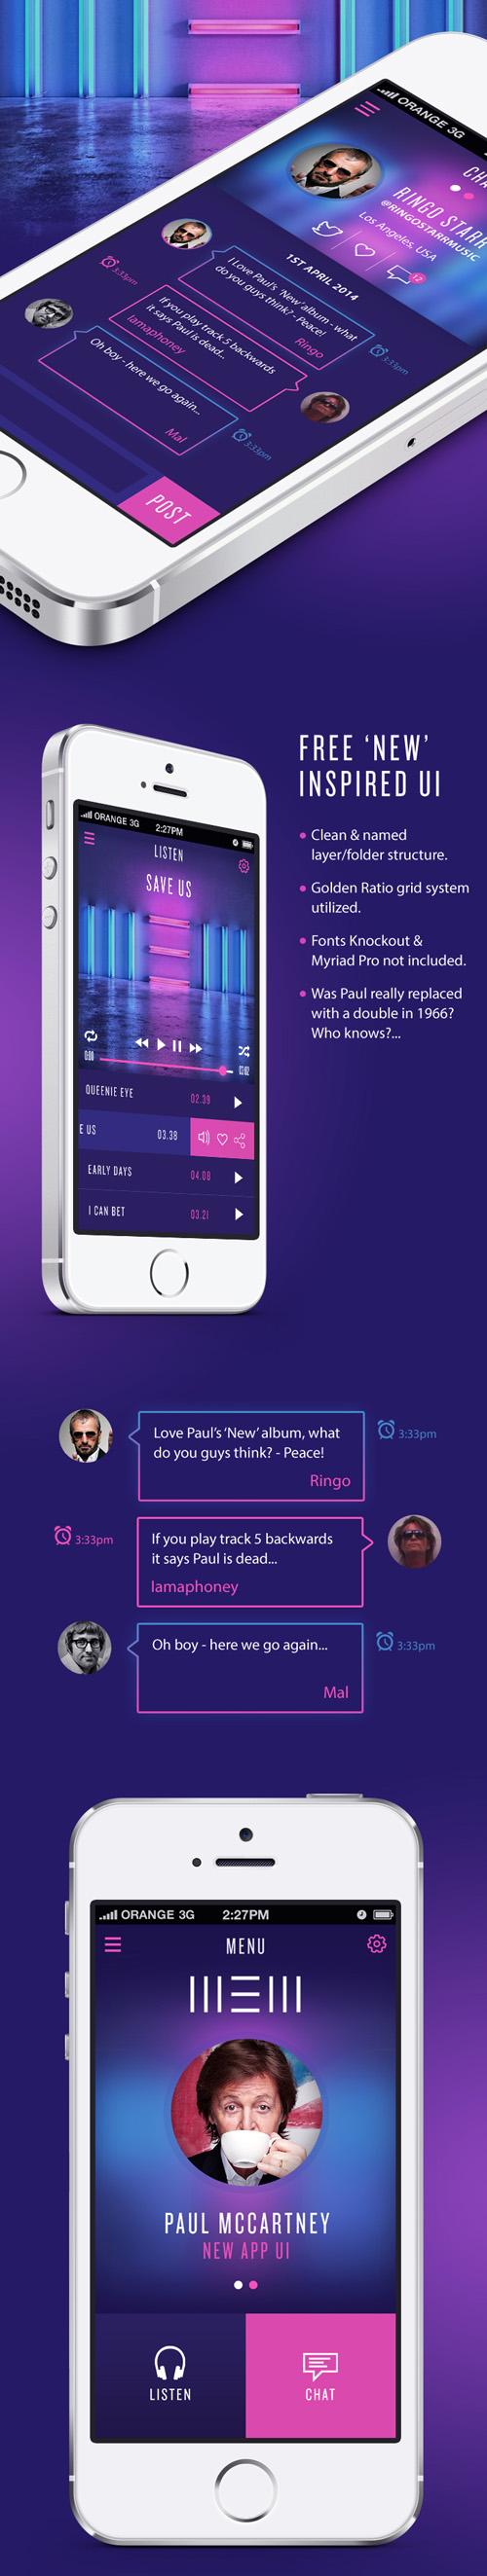 Paul McCartney 'New' inspired Free app UI PSD